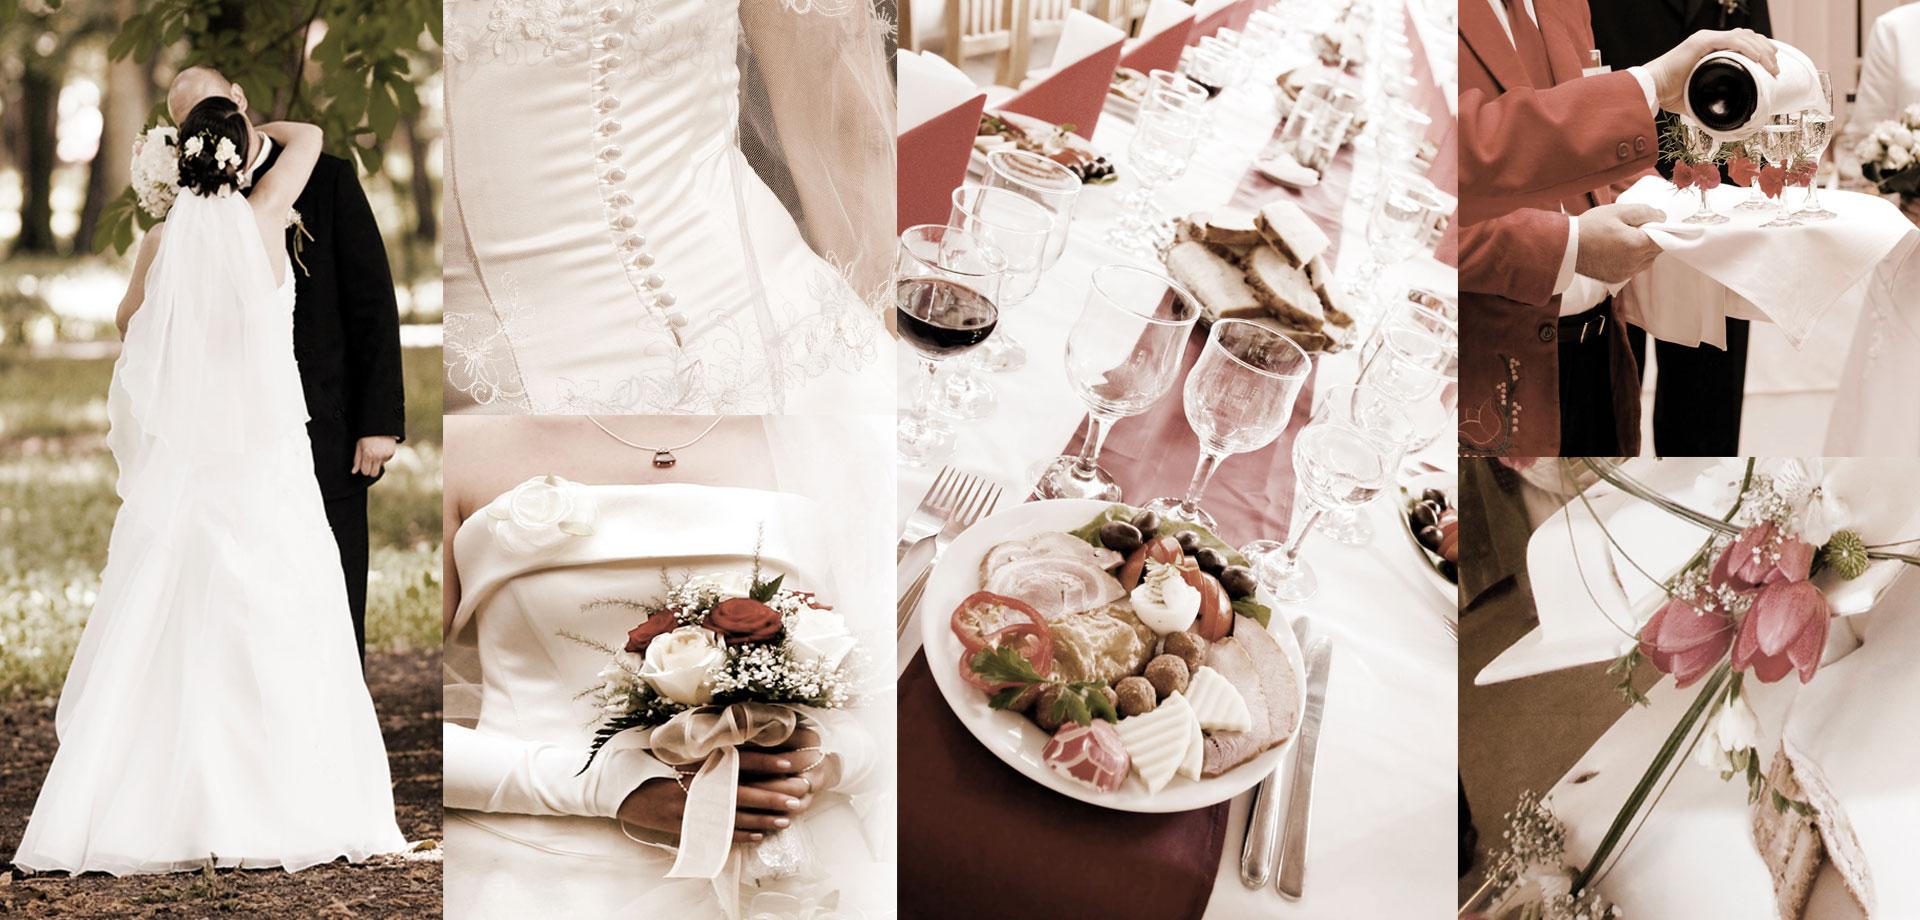 villa-selmi-ristorante-matrimoni-61